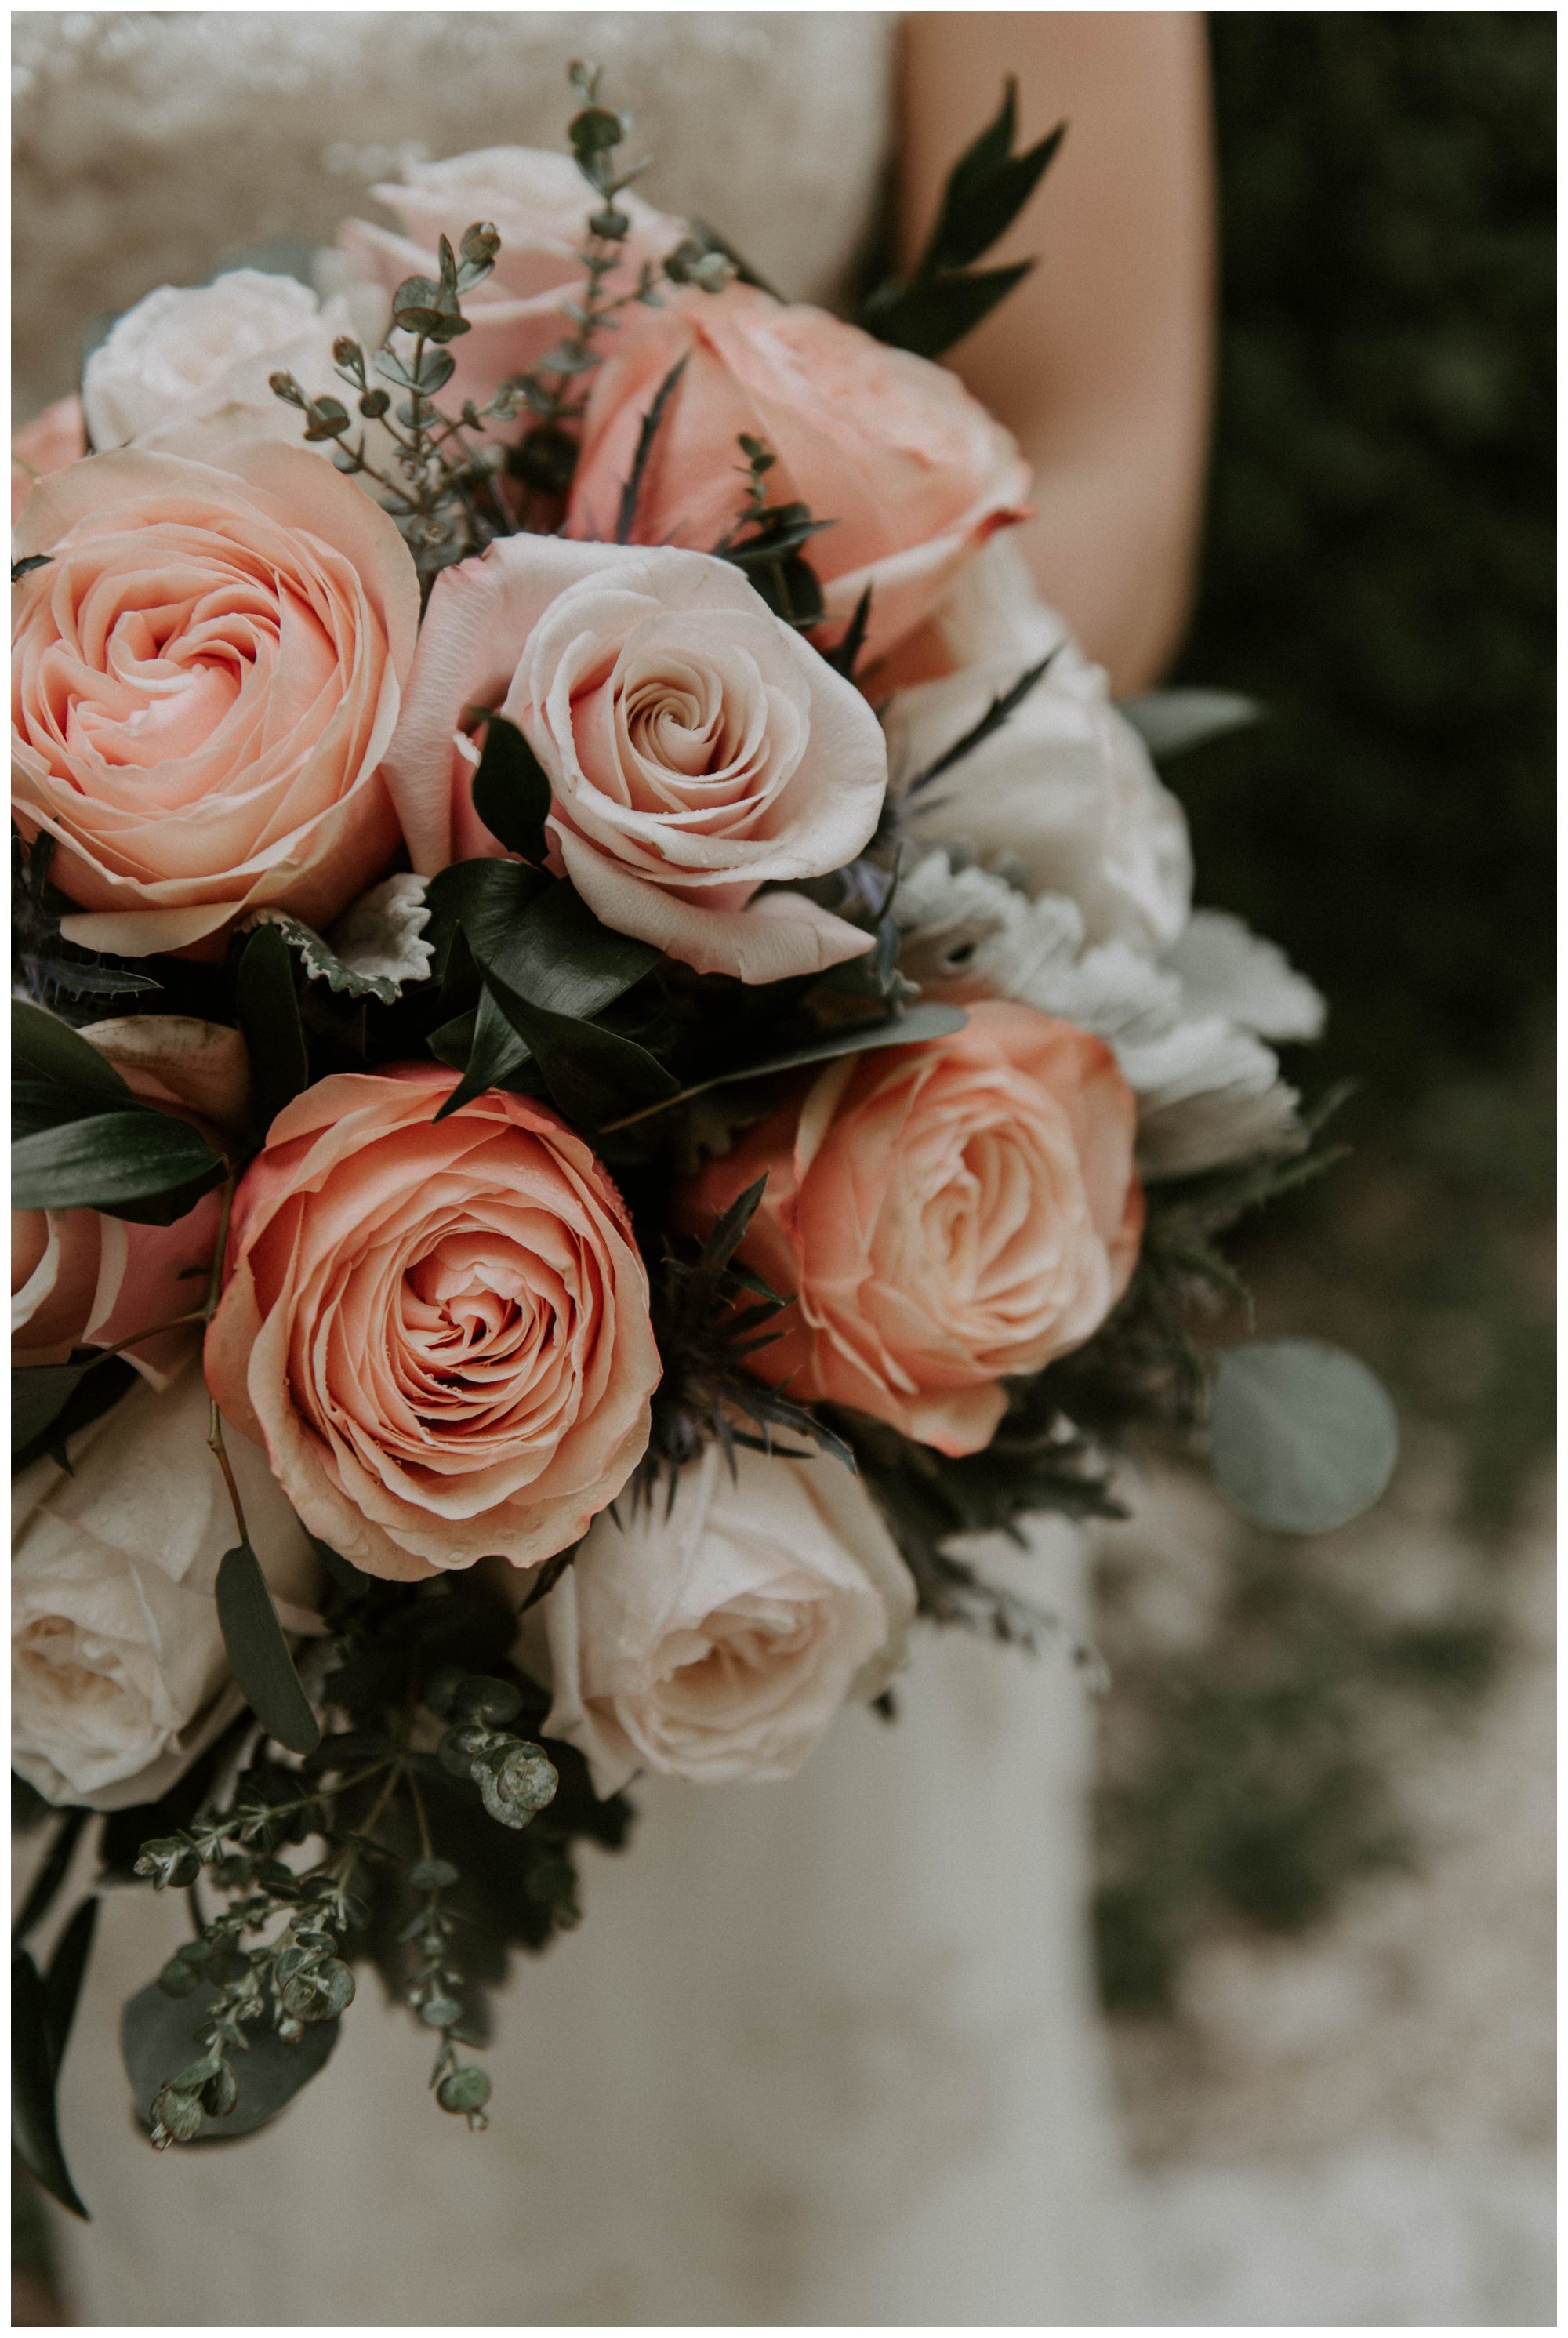 austin-texas-wedding-photography-1778-photographie_0032.jpg